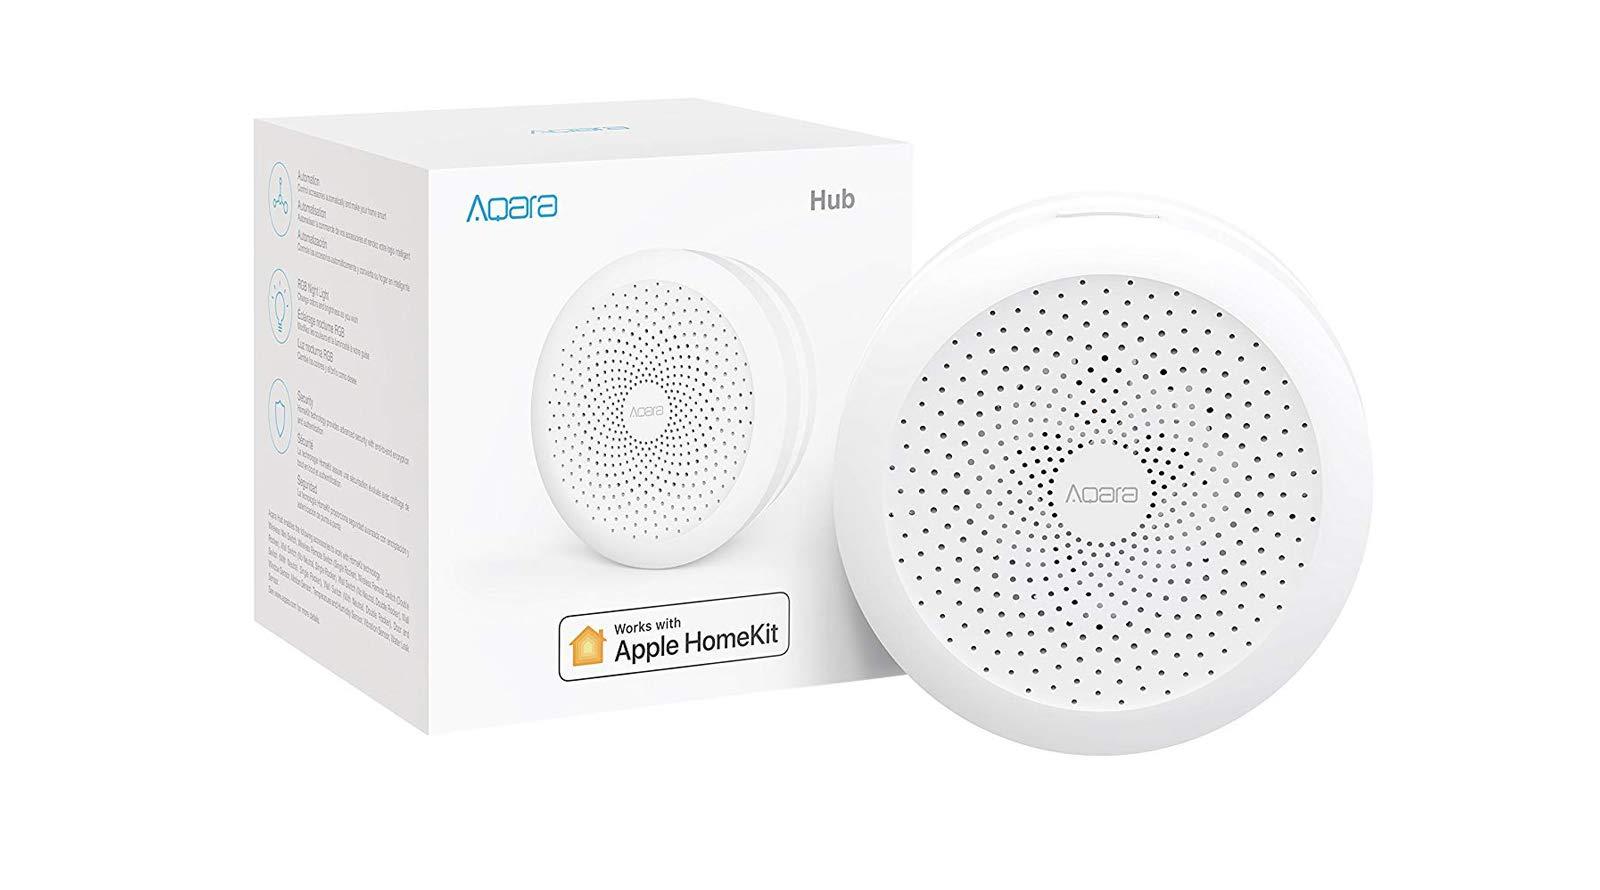 Aqara Hub Smart Home Hub and Alarm Works with Apple Homekit Siri + Free US Plug, in USA Stock